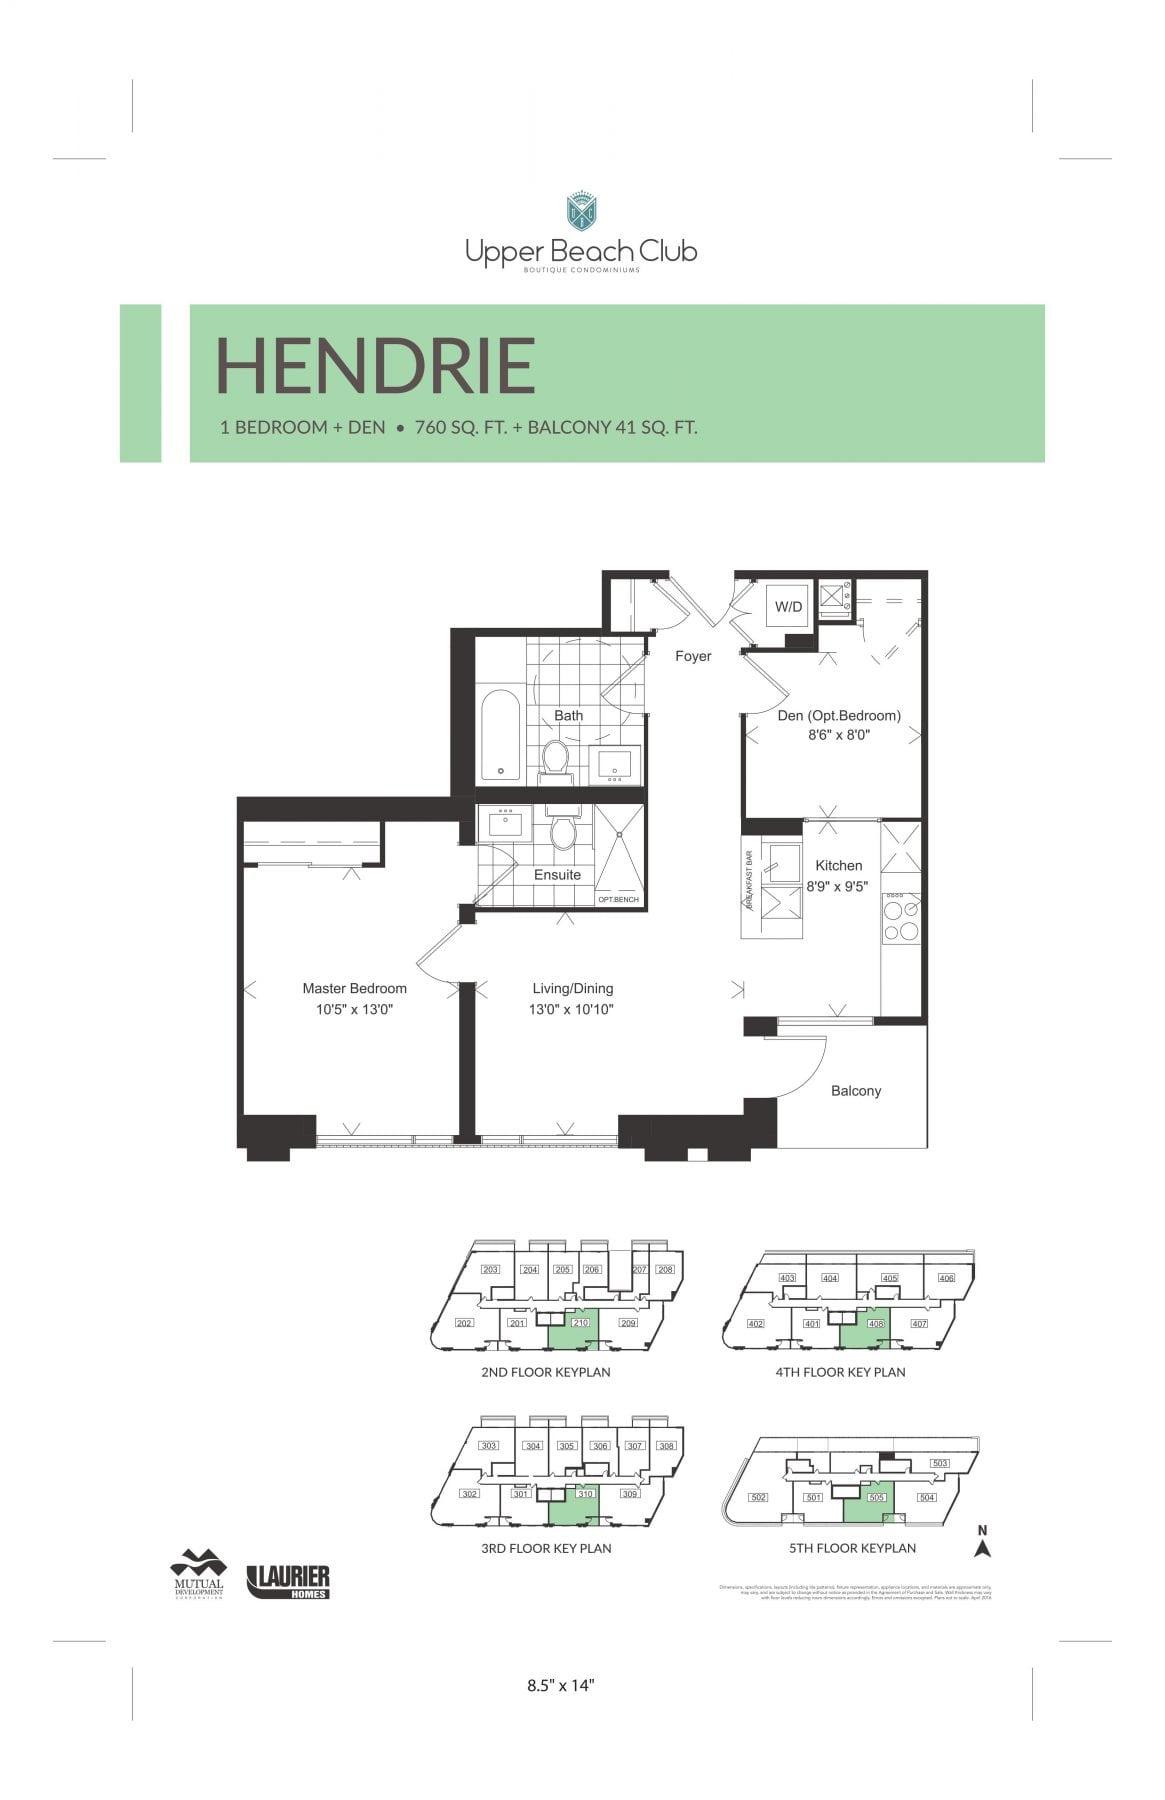 Hendrie Floor Plans JPG